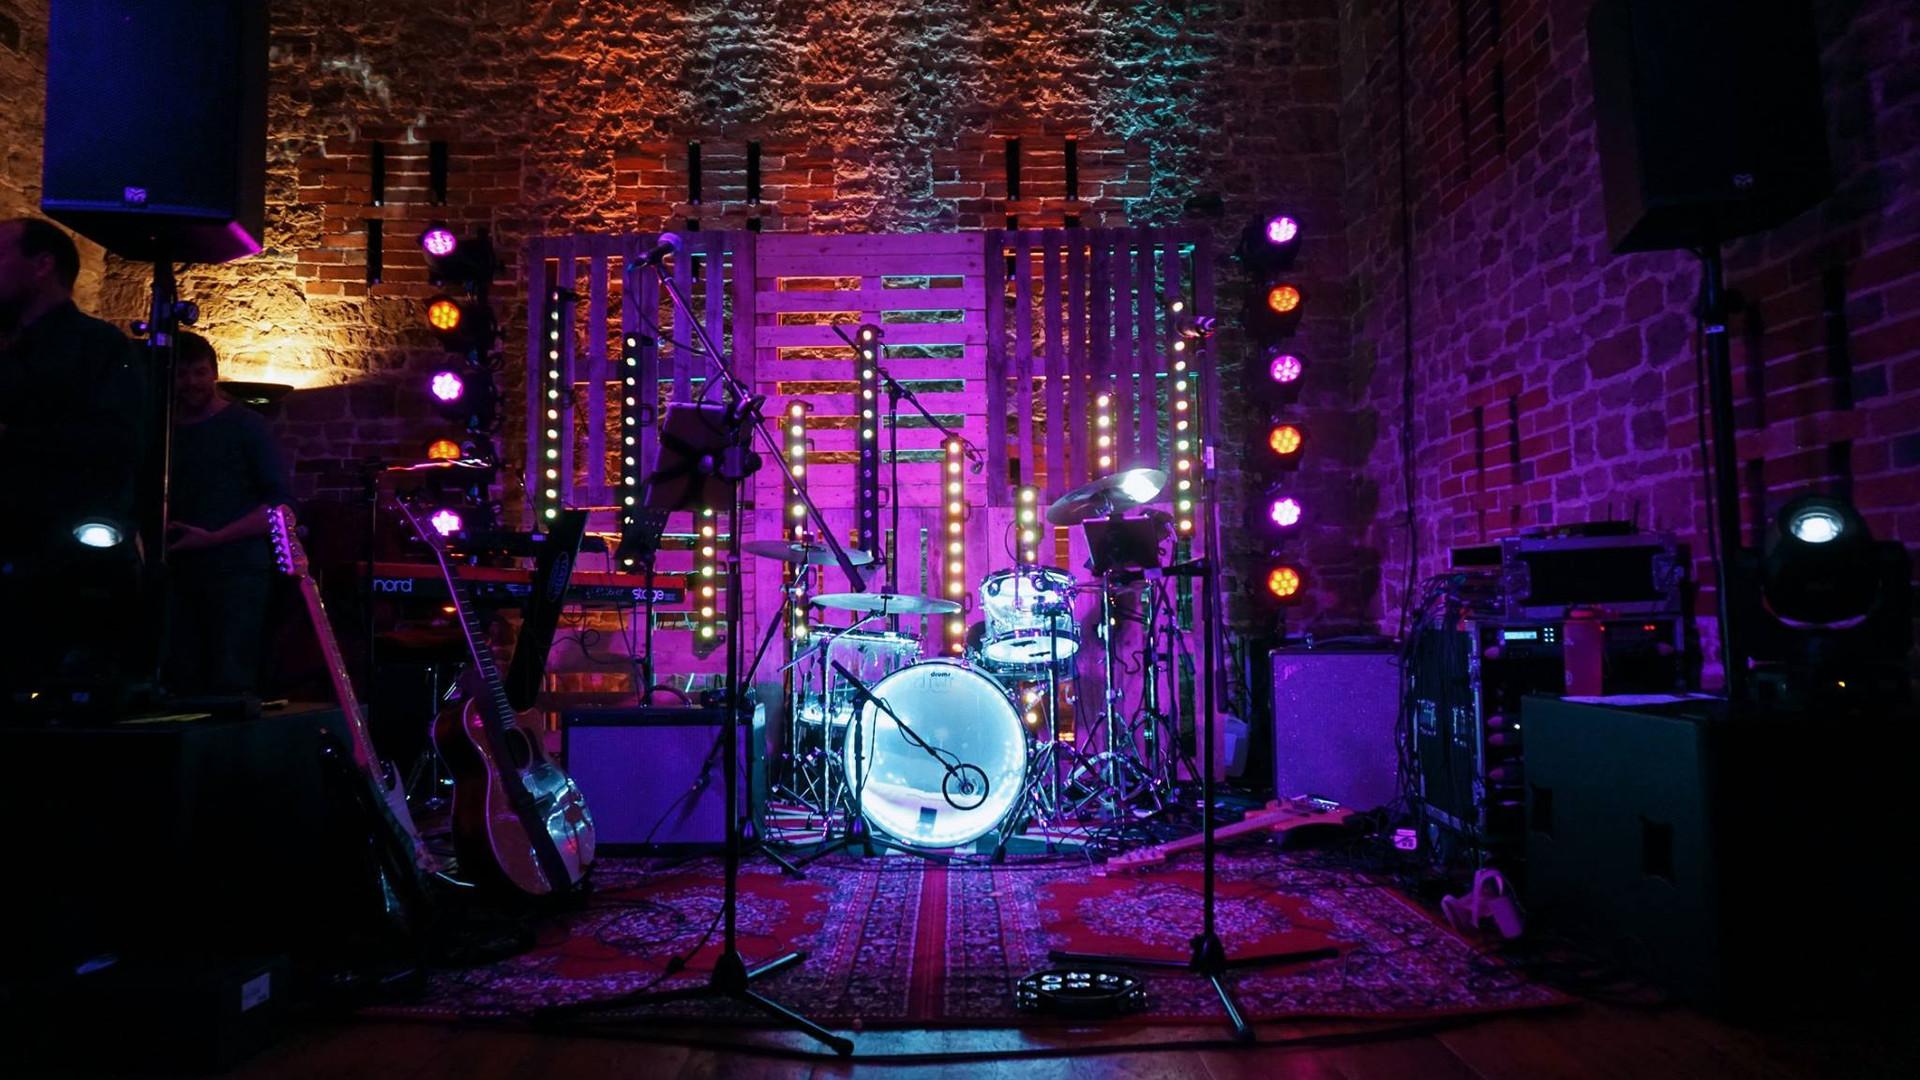 Party Event showcasing lighting & sound sytems